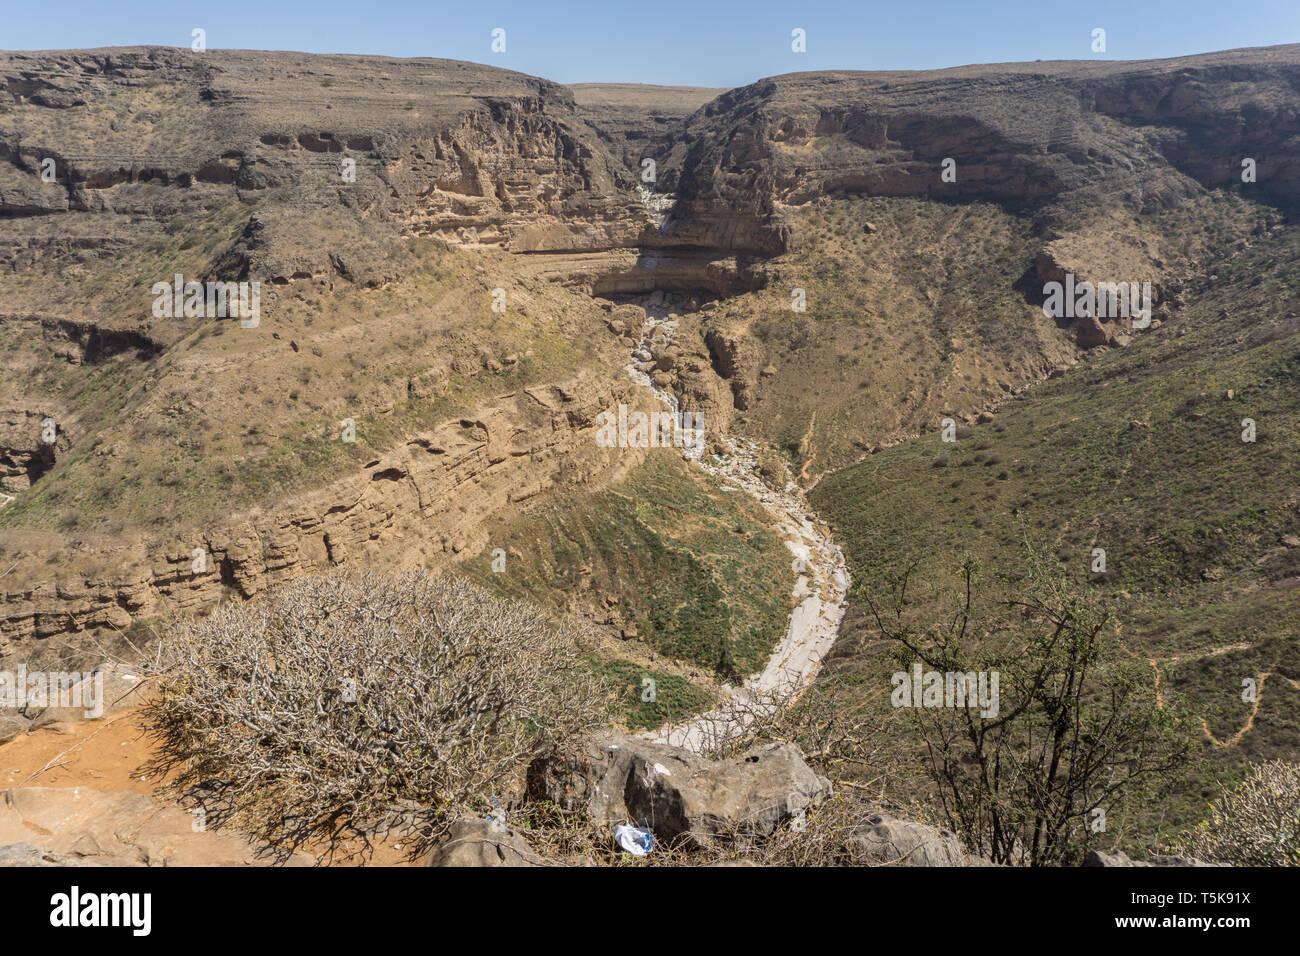 Teeq cave and Tawi Ateer Sinkhole, Dhorfar, Oman Stock Photo